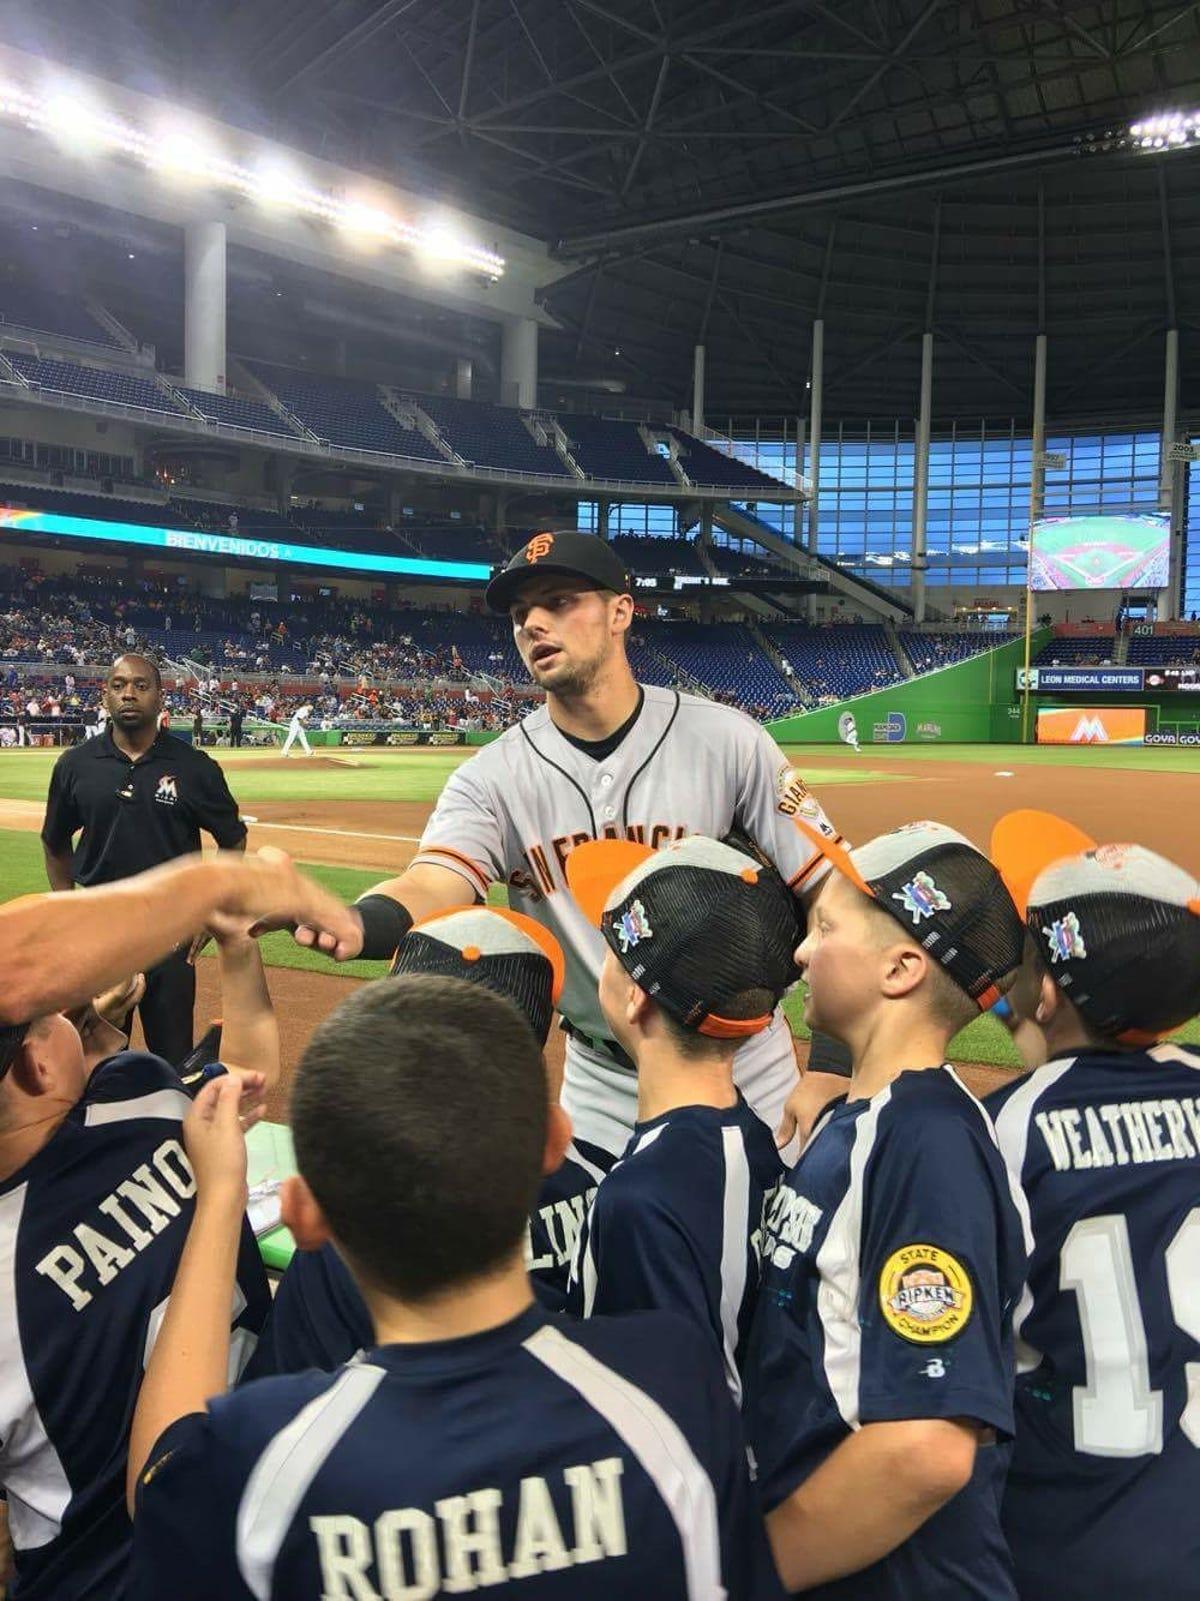 Poughkeepsie Lightning youth baseball set for World Series